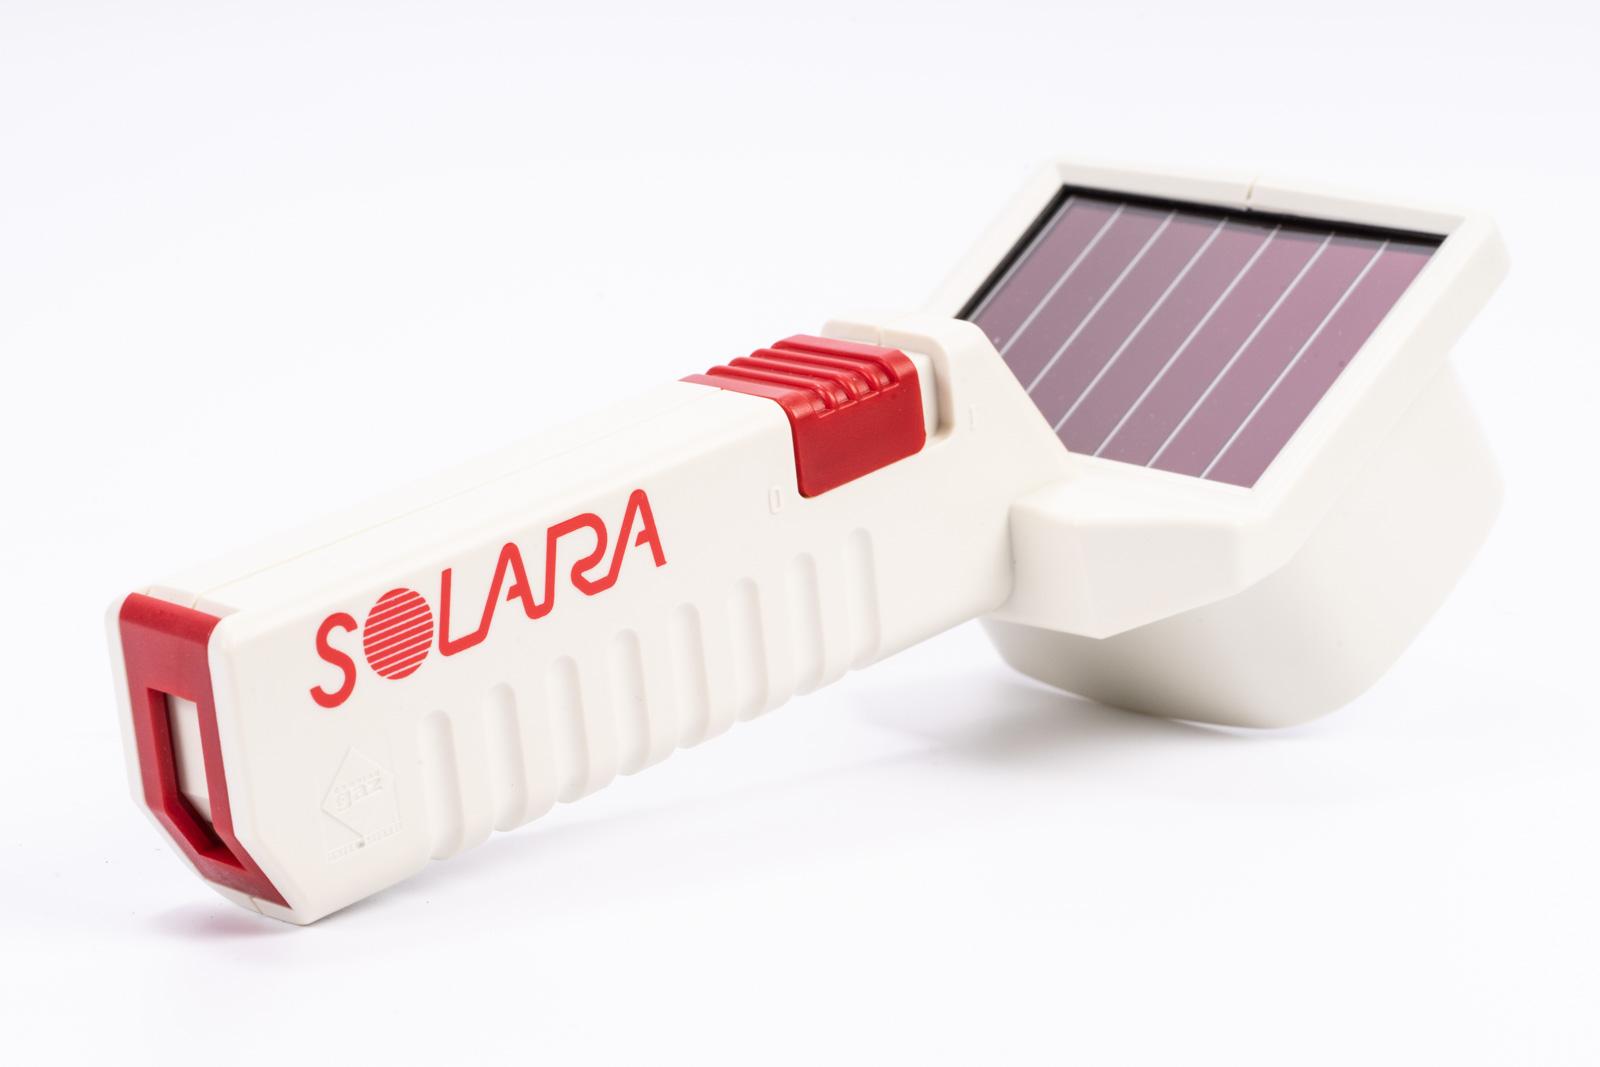 Solara Solar Powered Lamp